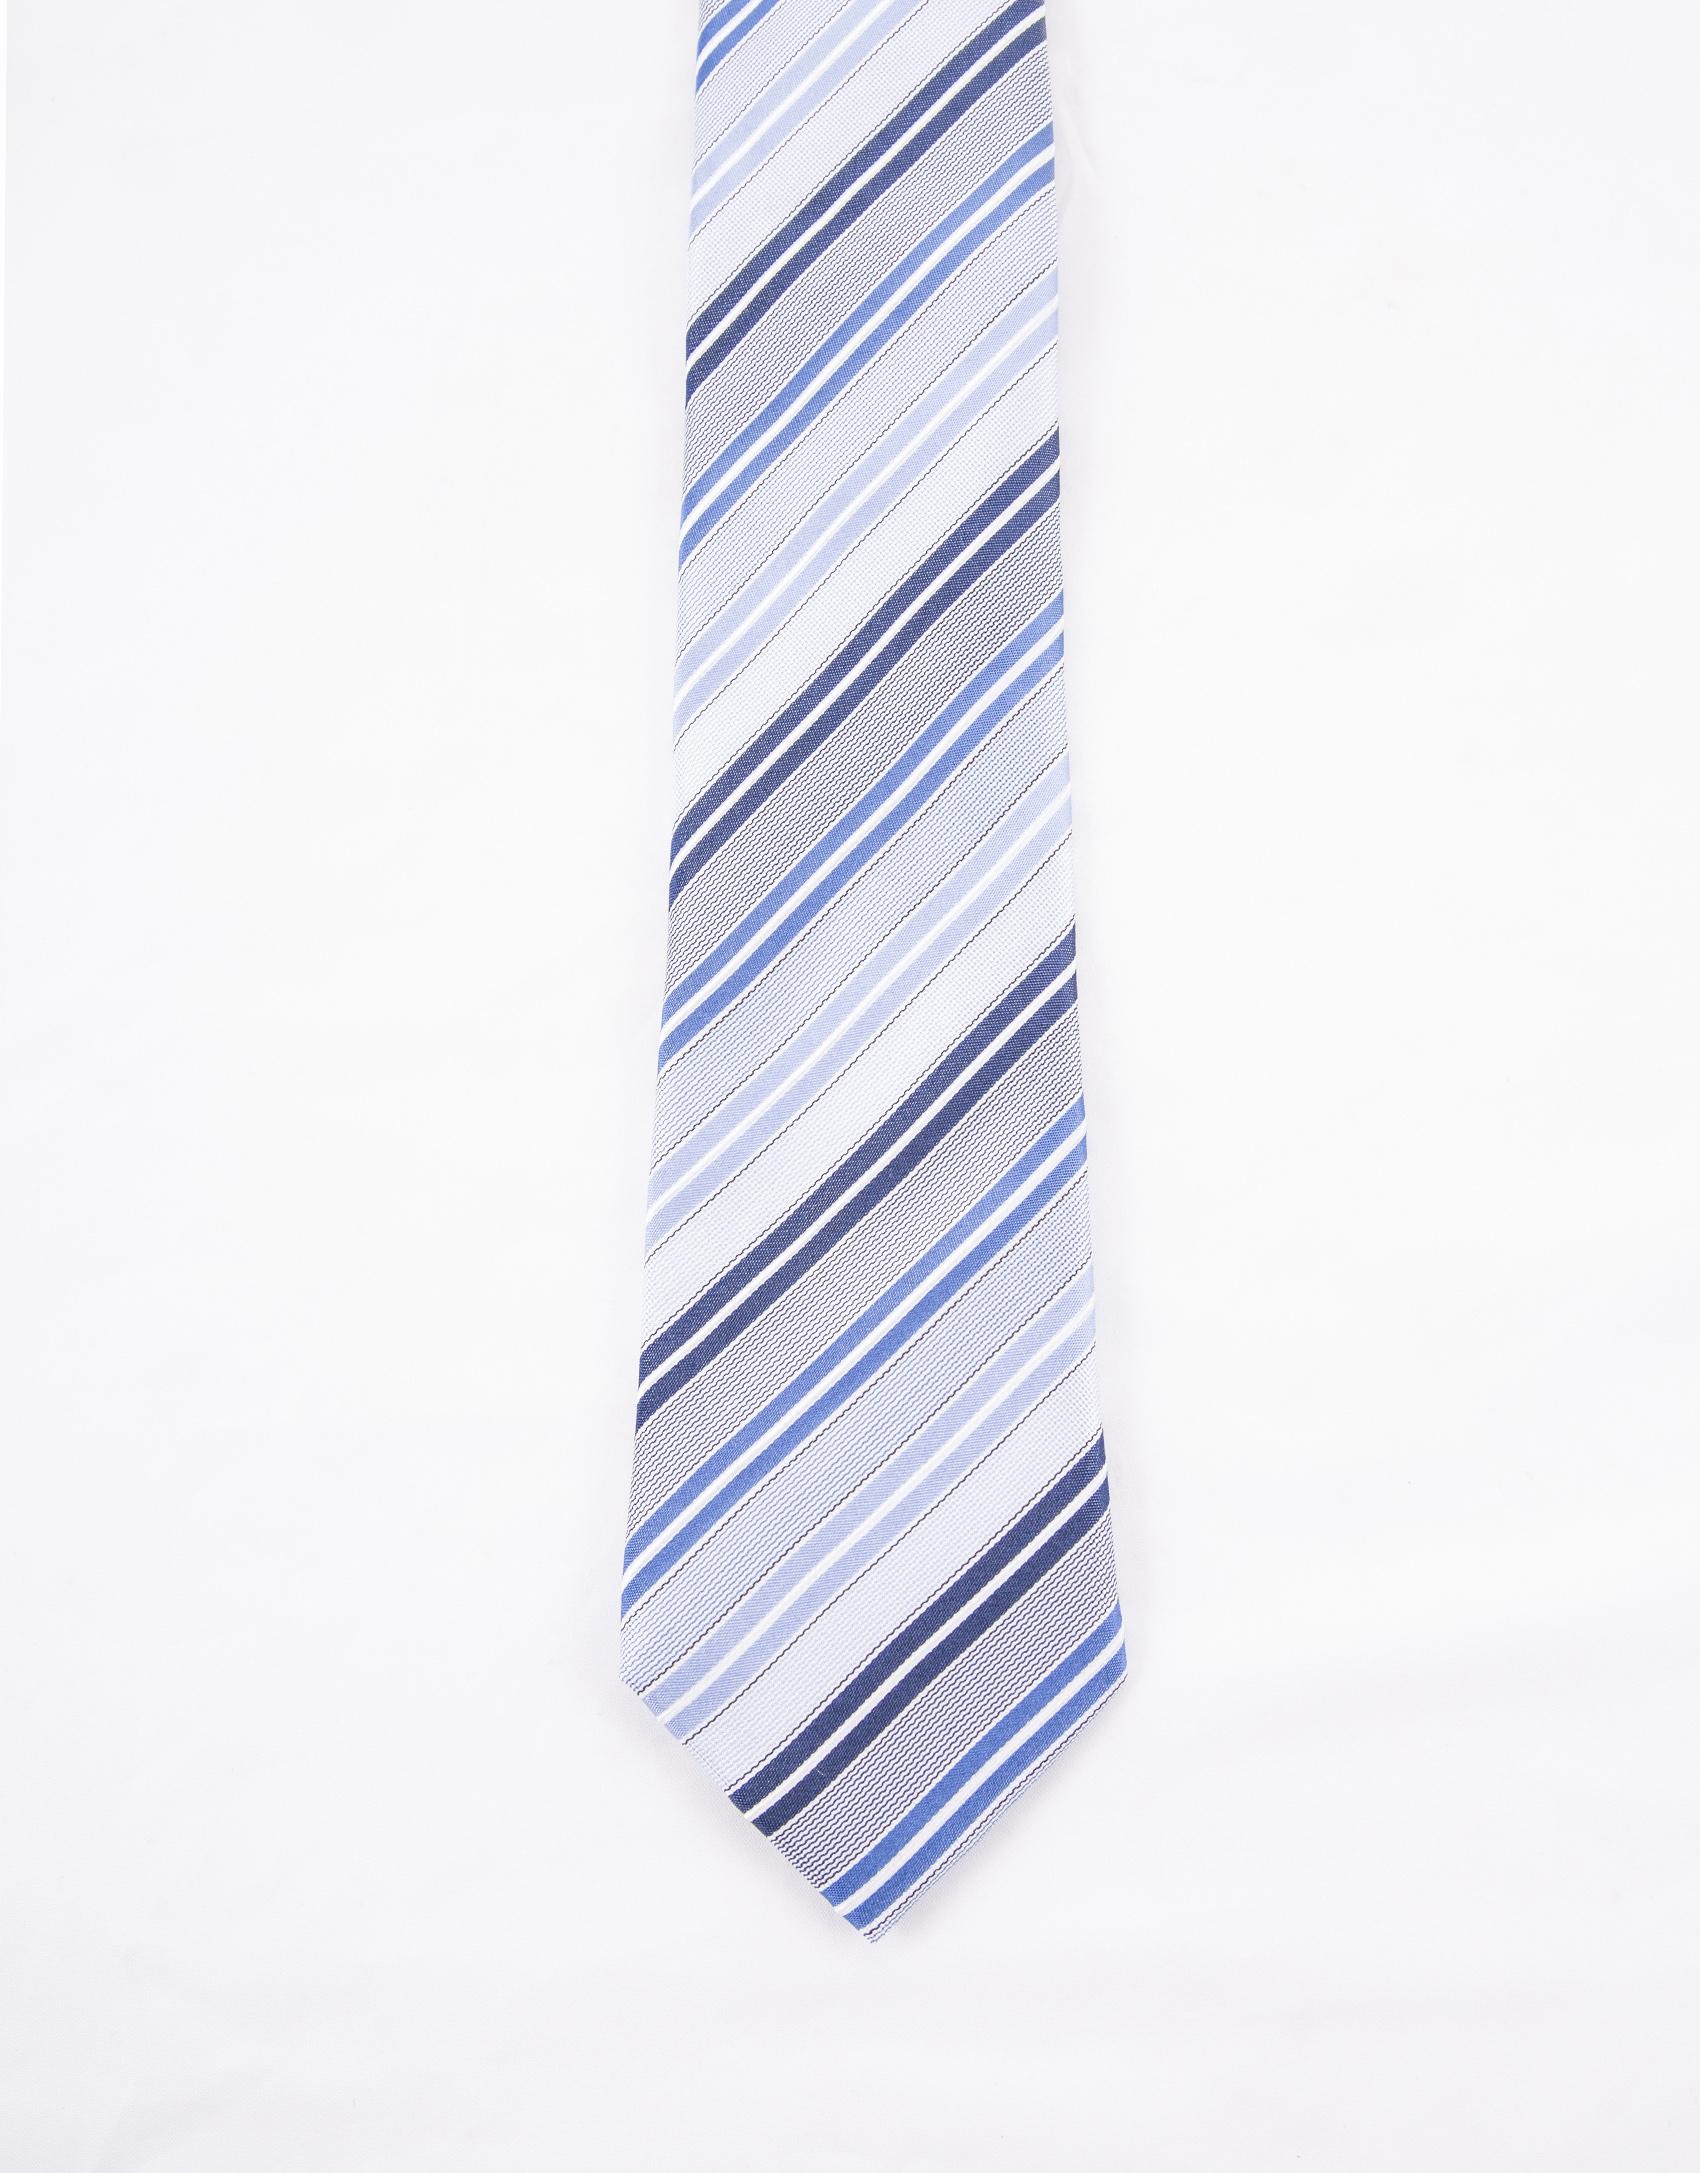 Corbata rayas tonos azules - Tonos azules ...